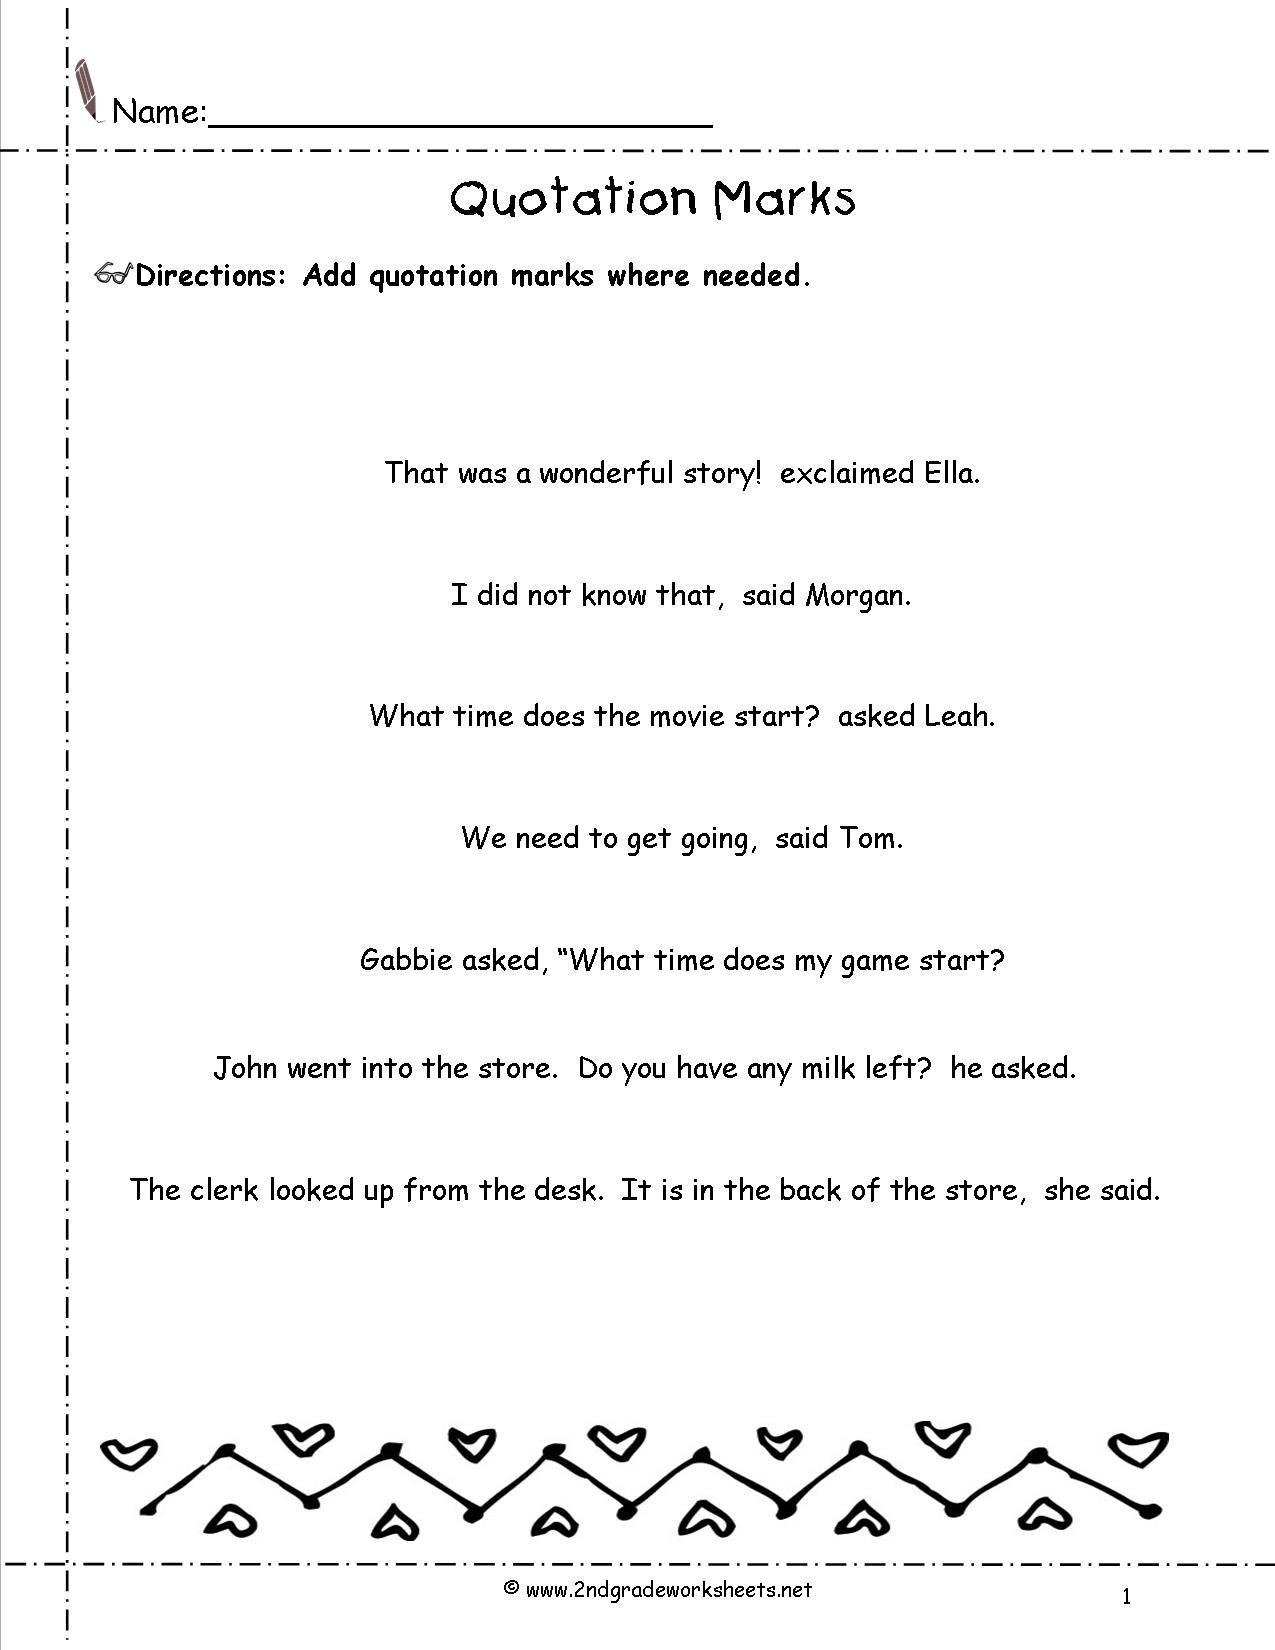 Quotation Worksheets 4th Grade 80 Worksheets for Quotation Marks 2nd Grade 2nd Quotation